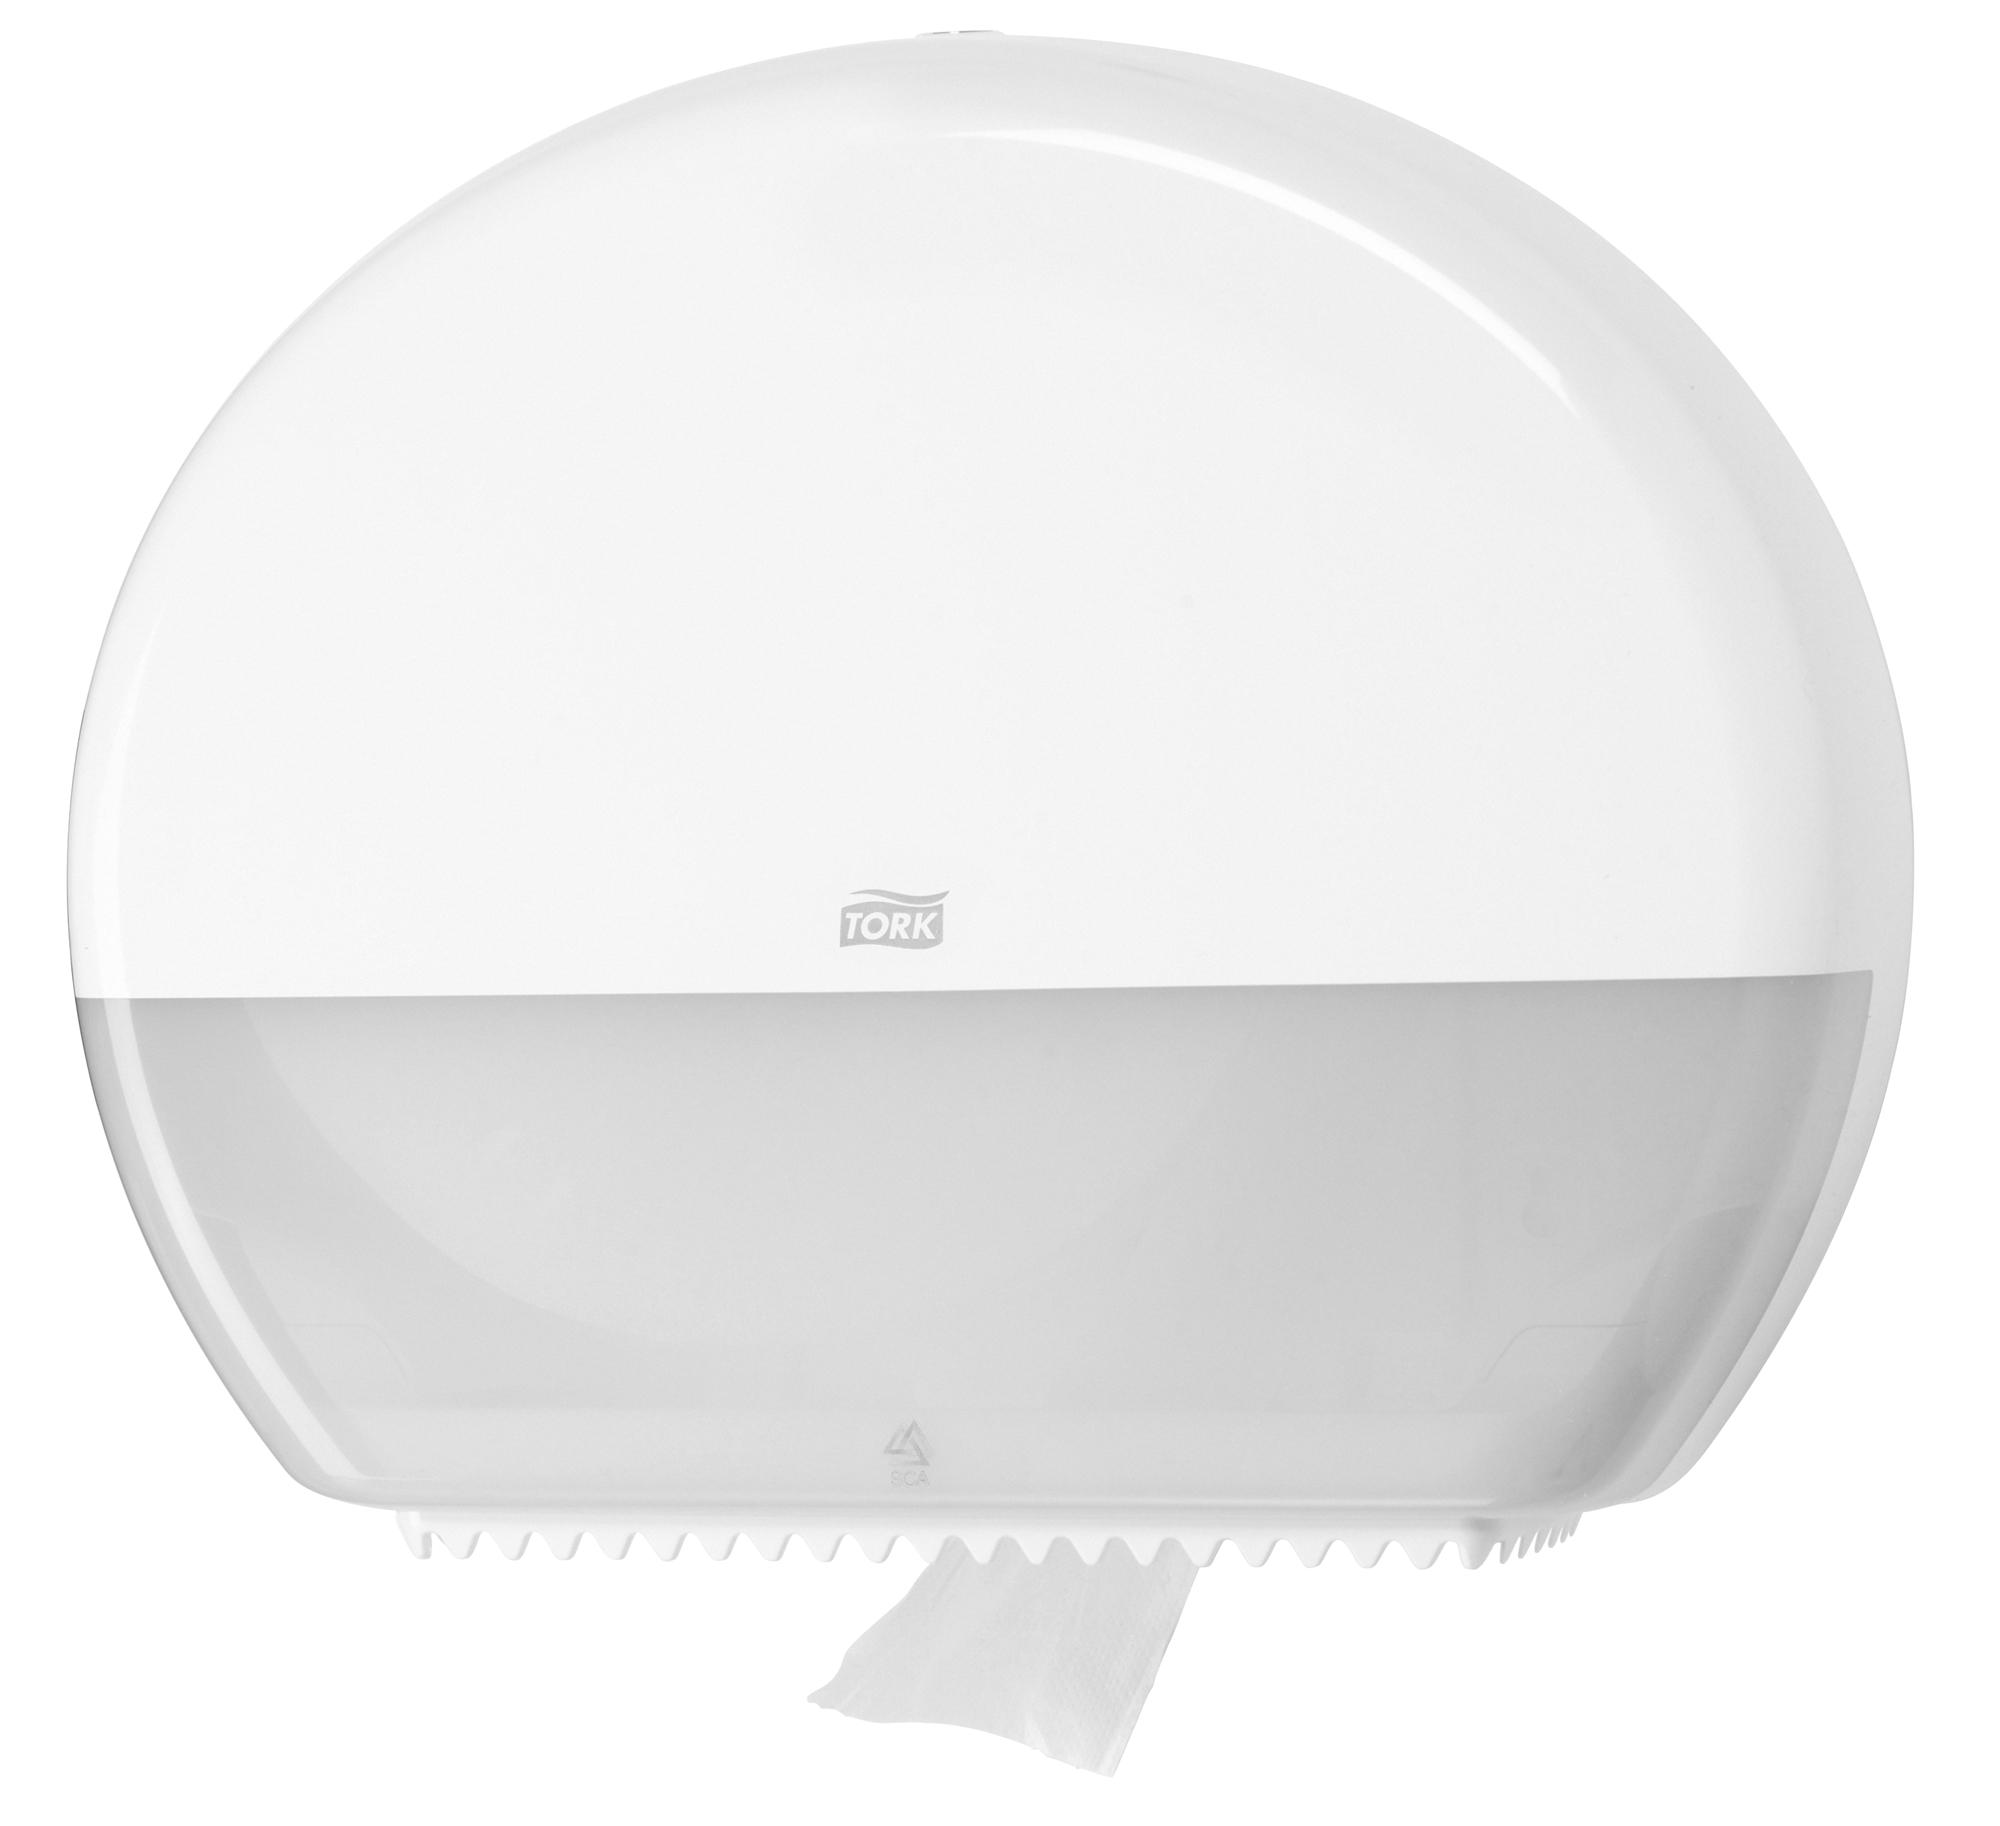 distributeur papier toilette jumbo tork. Black Bedroom Furniture Sets. Home Design Ideas